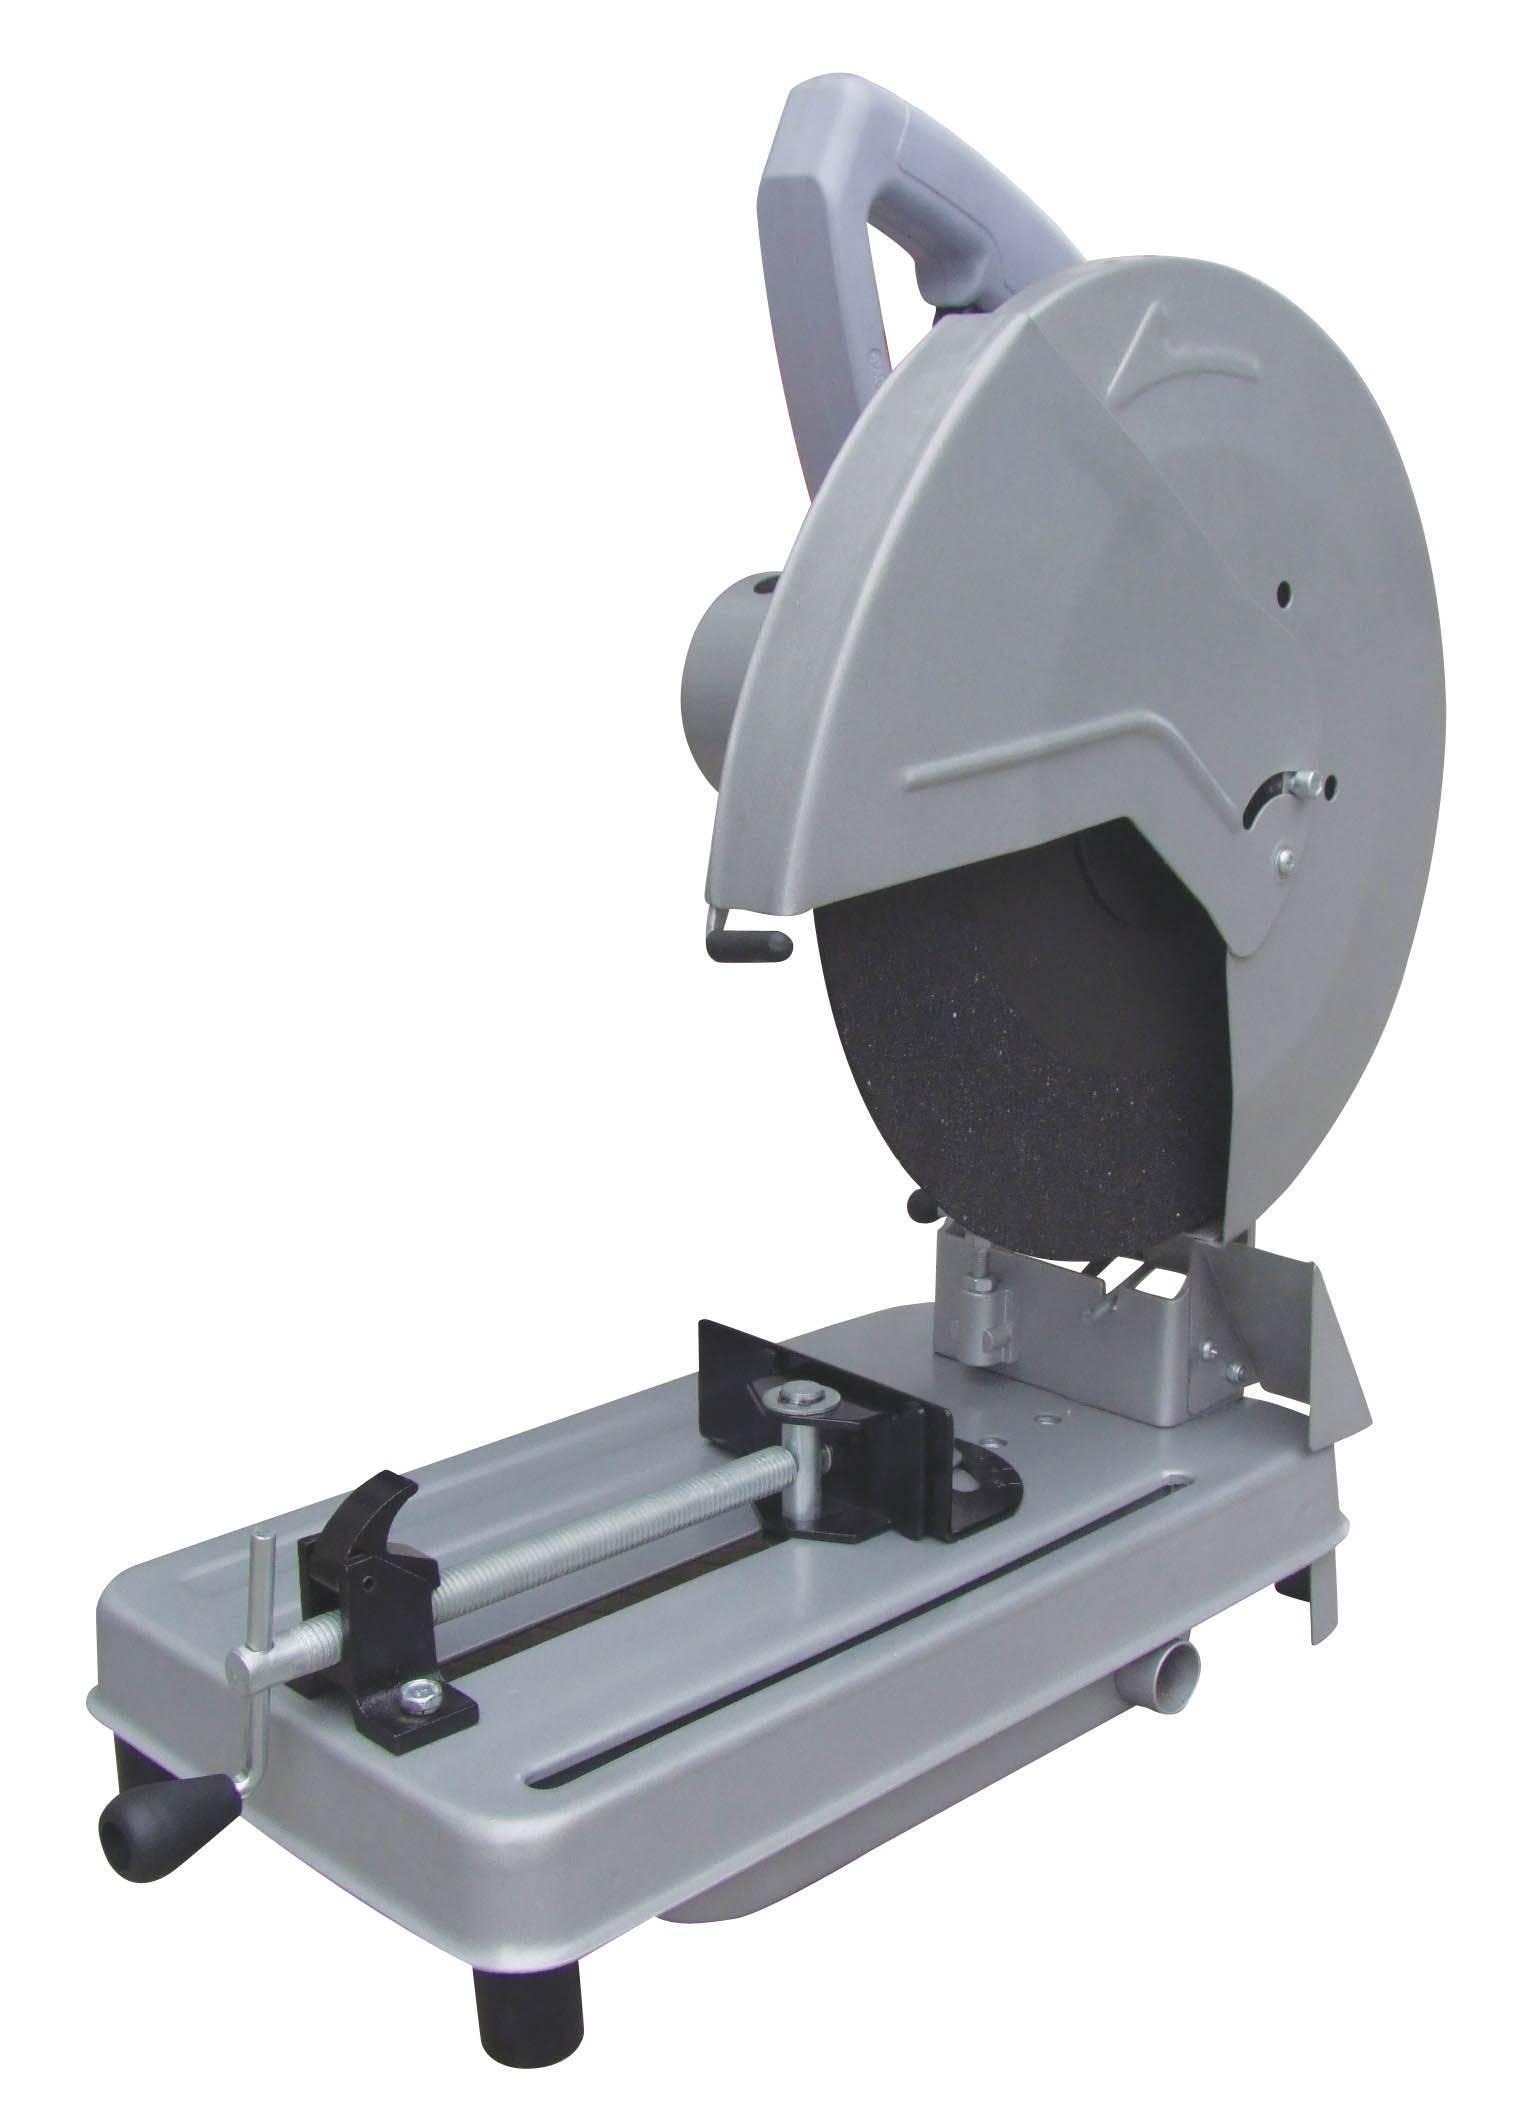 355MM (14) Professional metal cutter/cut off saw/chop saw/cut off machin